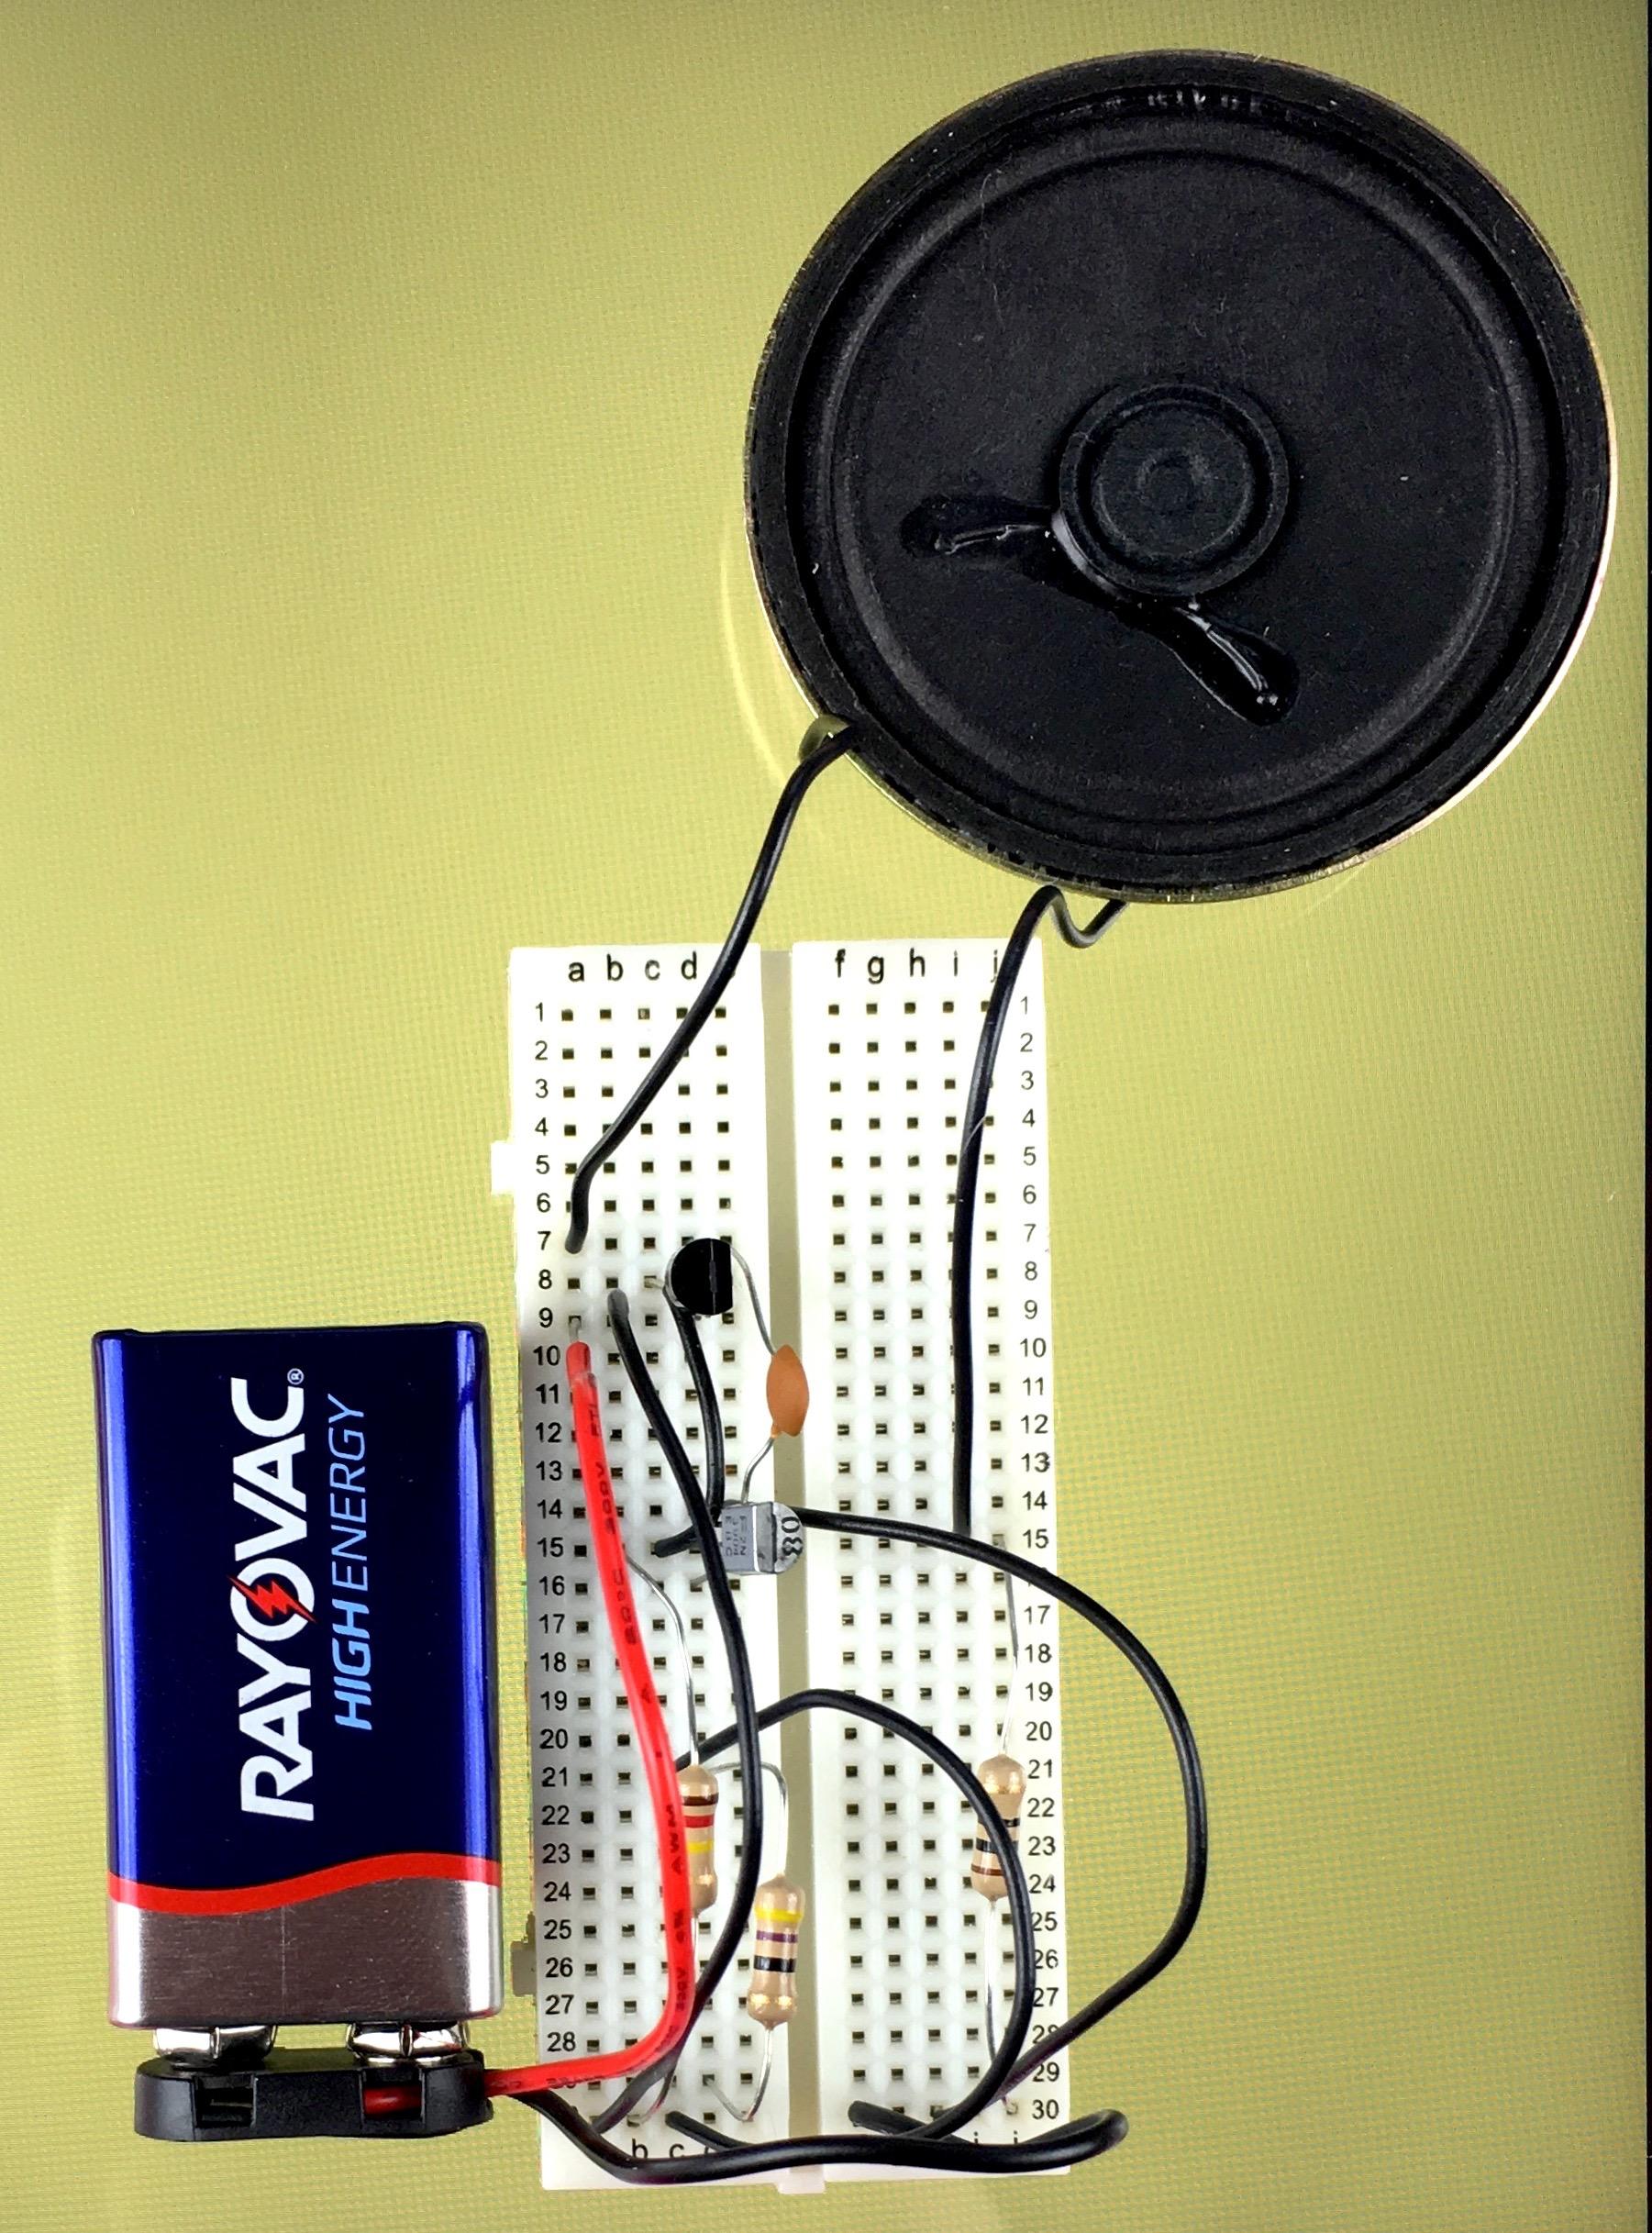 The Basics Lab 14 - 2 Transistor oscillator